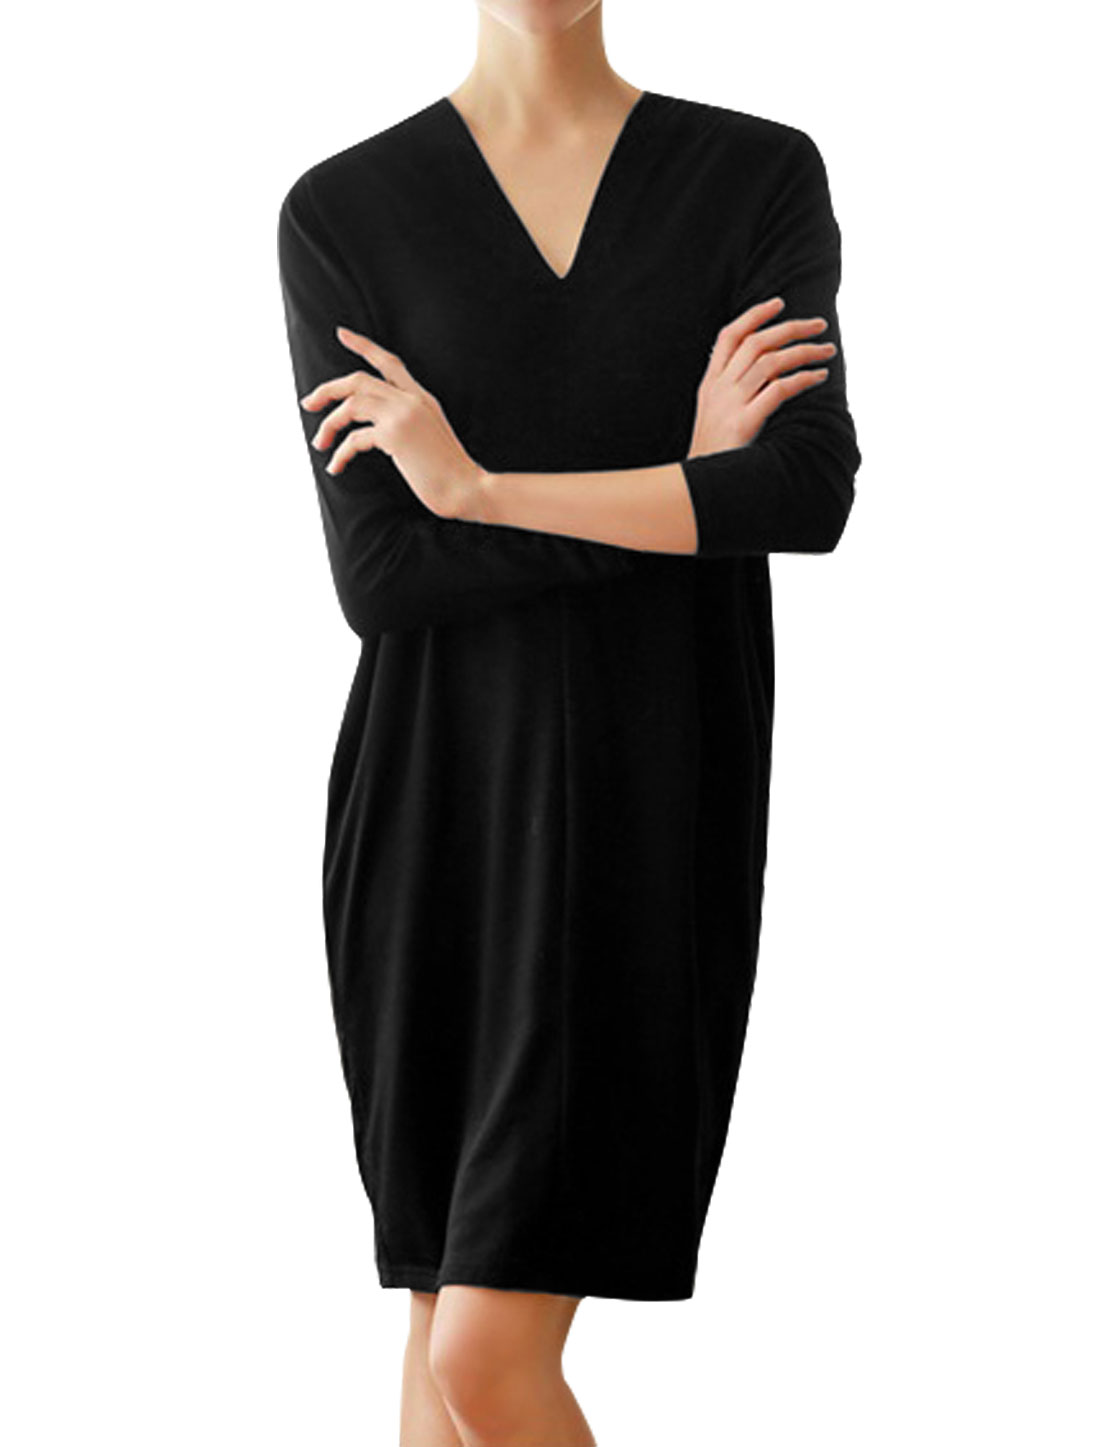 Women V Neck Dolman Sleeves Drop Shoulder Straight Tunic Dress Black XS